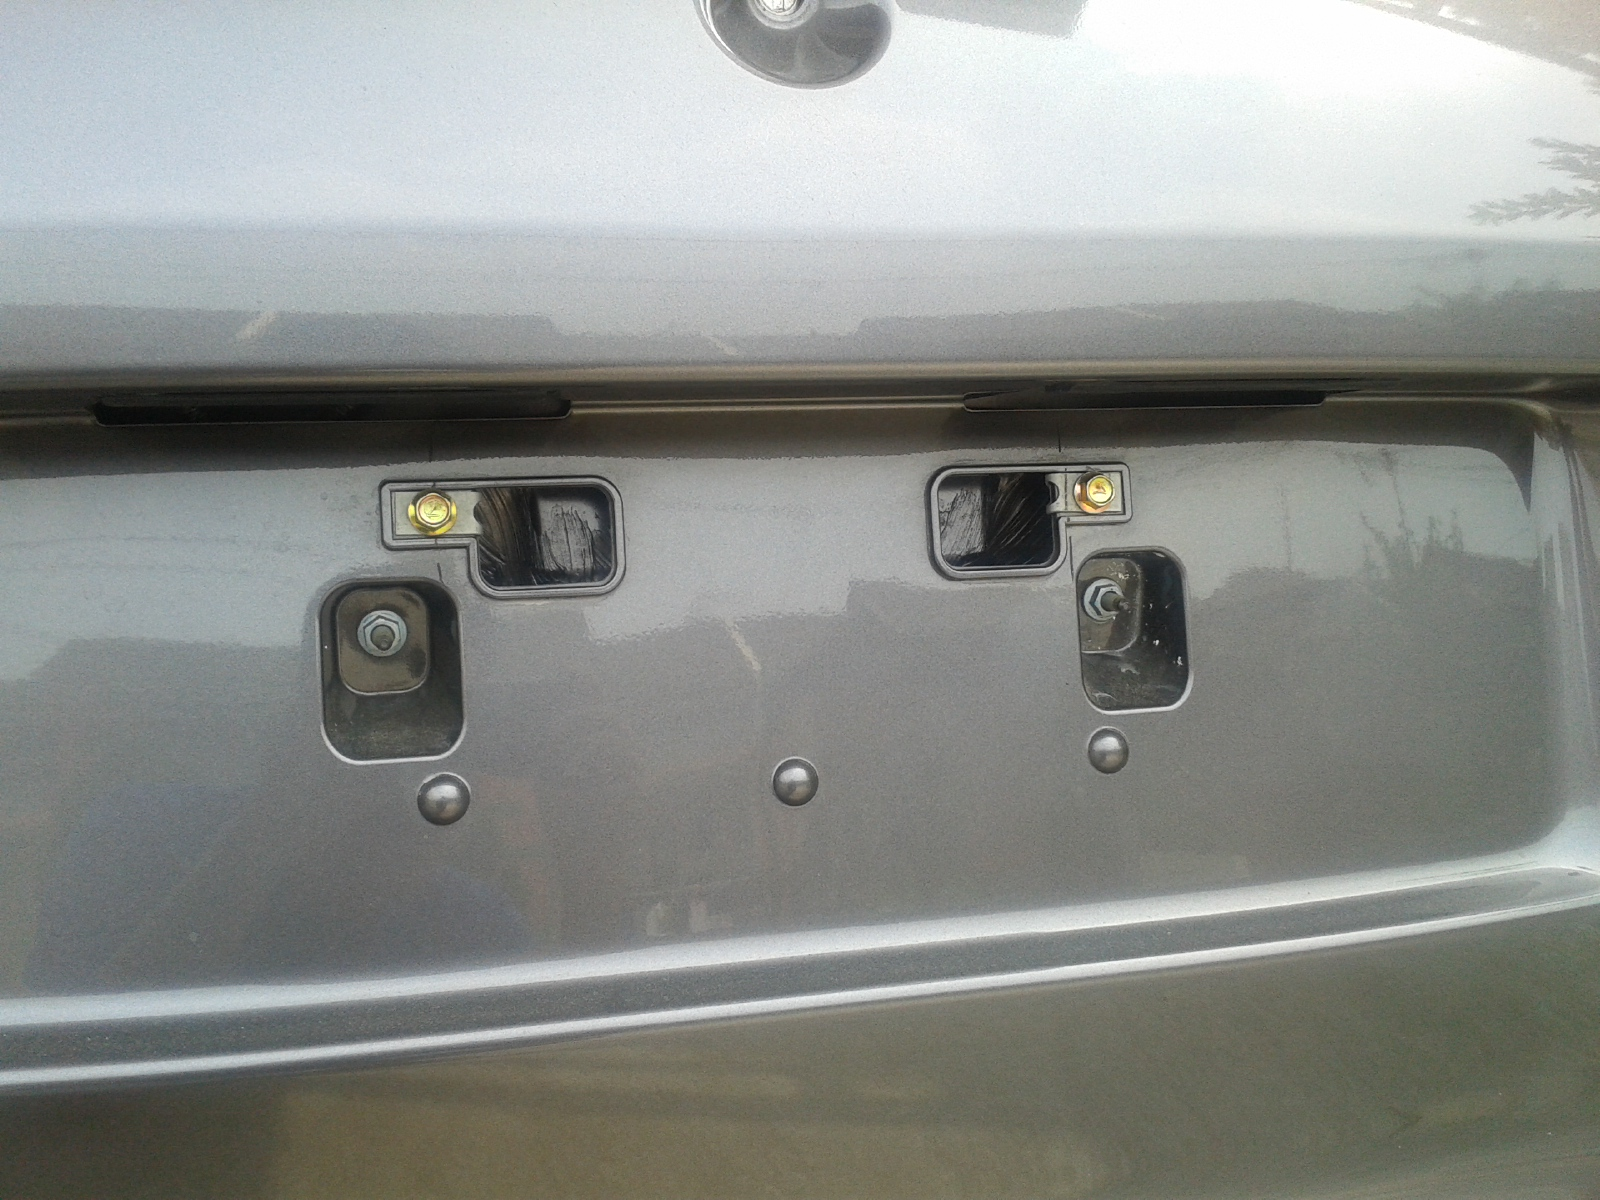 Cara Memasang Plat Nomor Mobil Cover Izy Tempat Nomer Brio Satya S Belakang